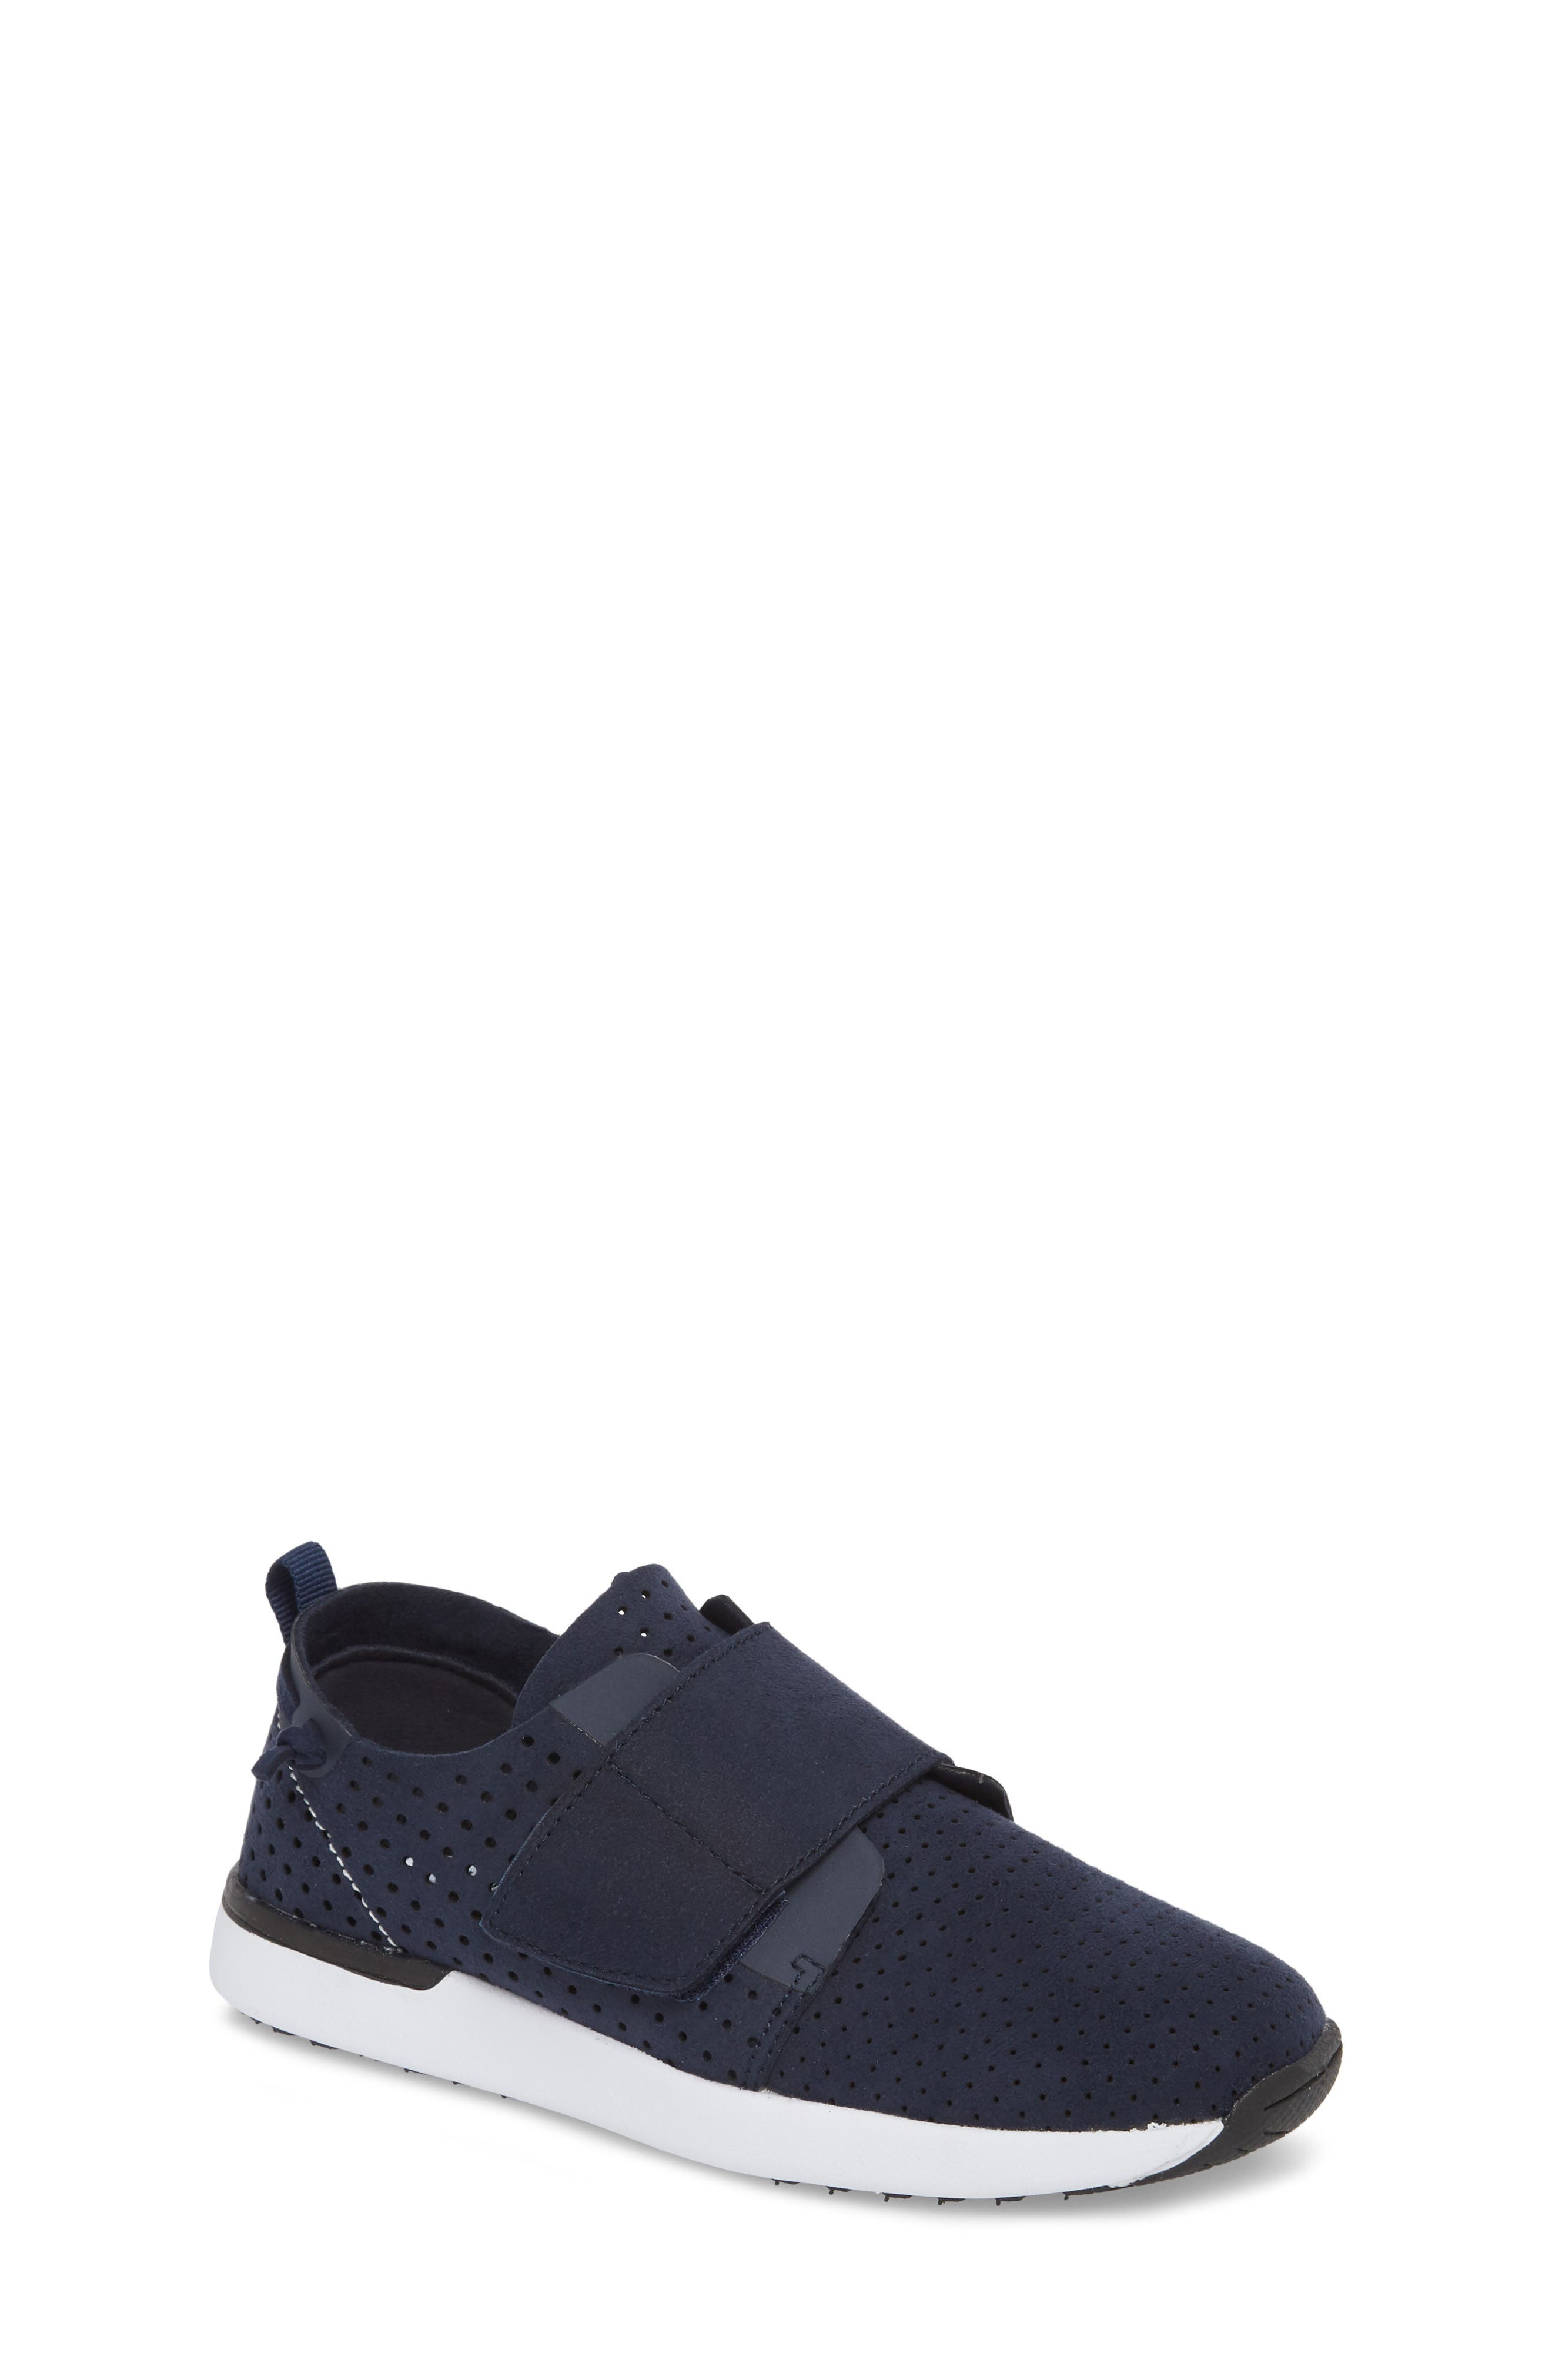 Brixxnv Perforated Sneaker,                             Main thumbnail 1, color,                             NAVY